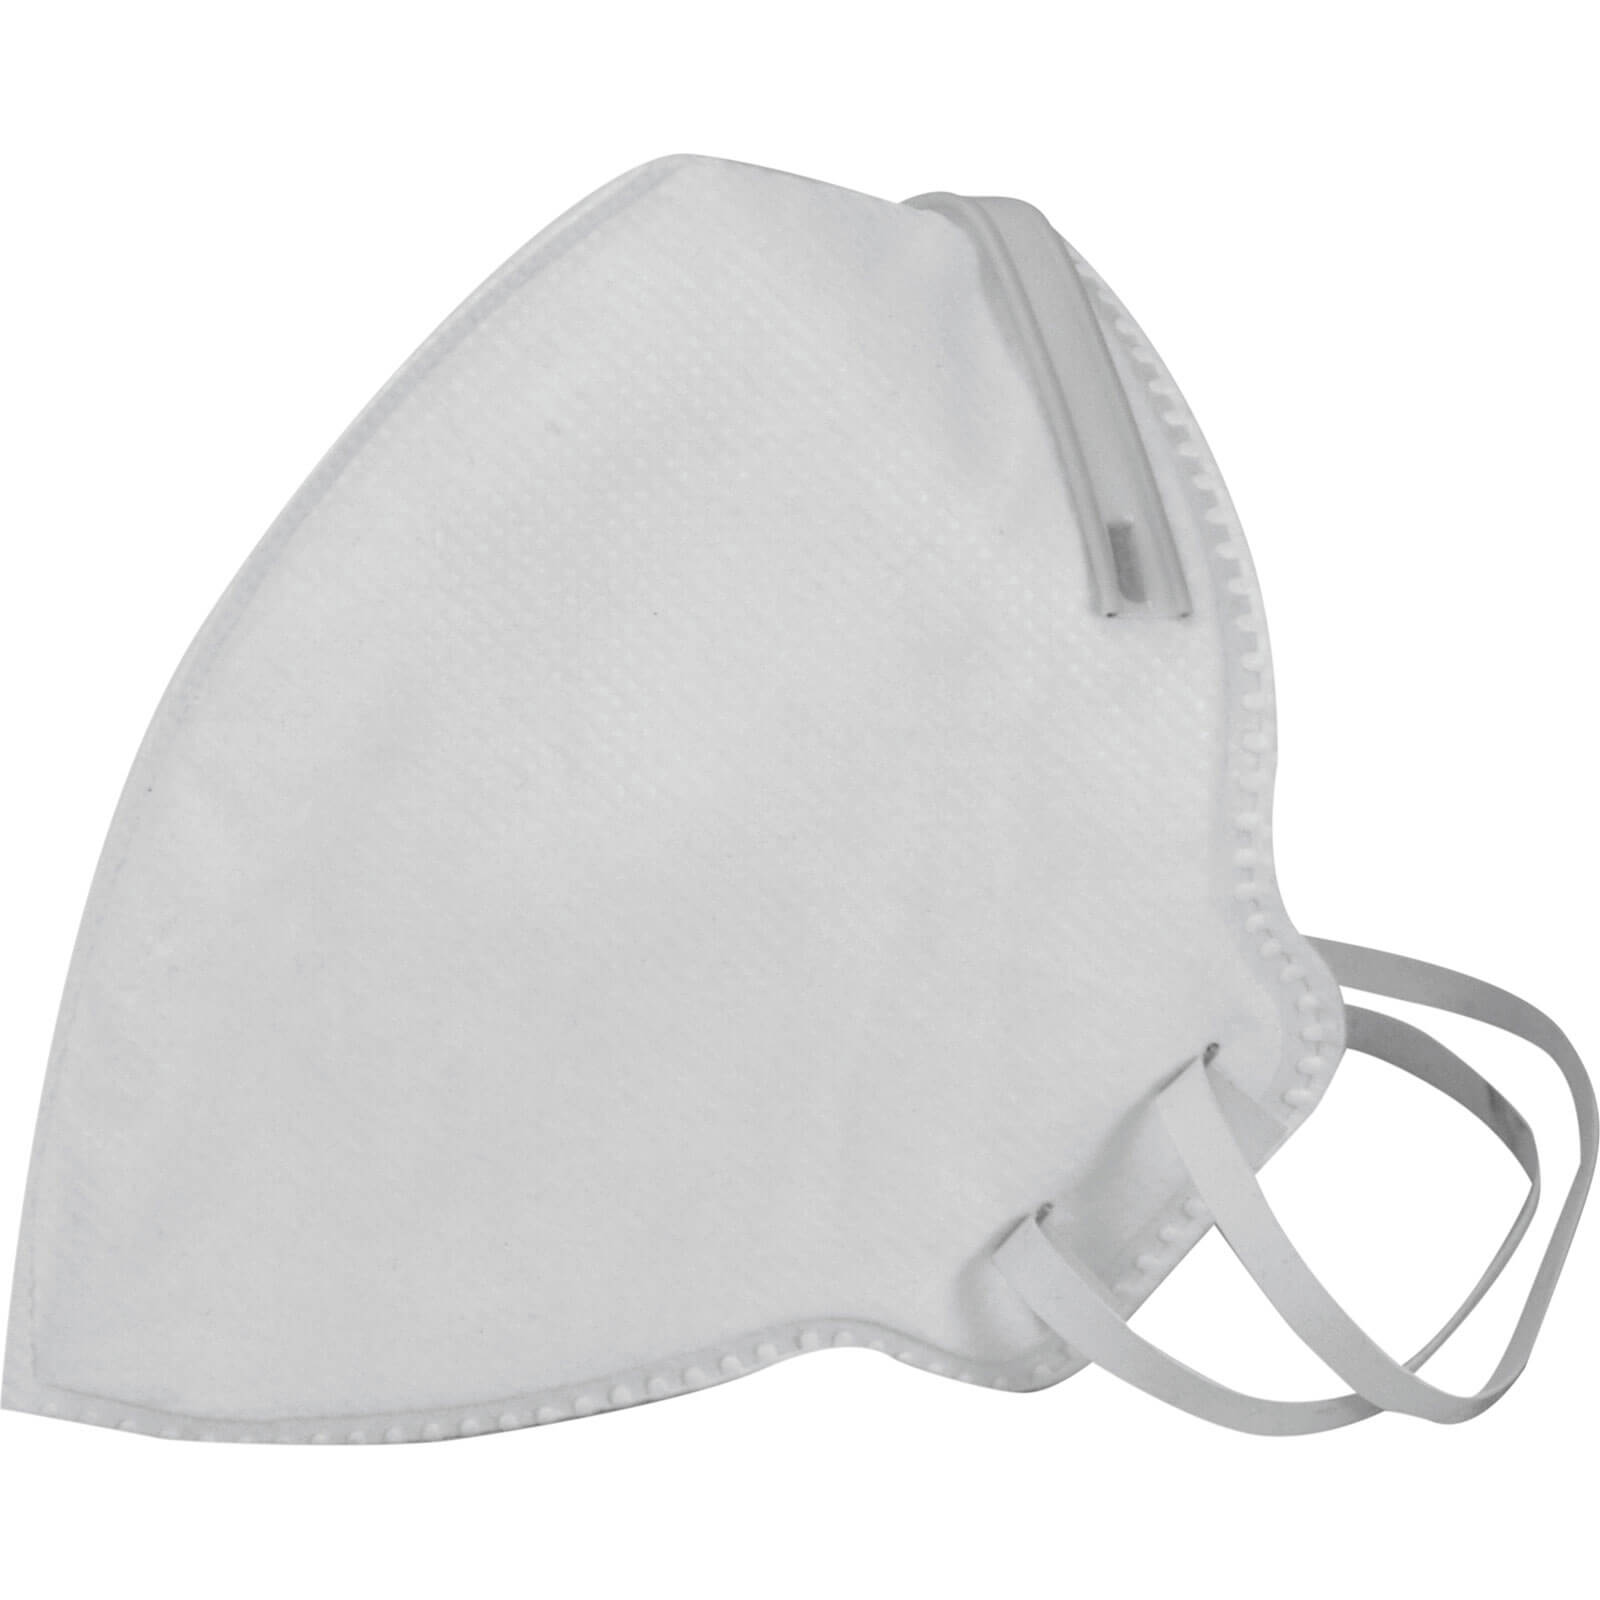 Vitrex Fold Flat FFP2 Dust Mask | Disposable Masks